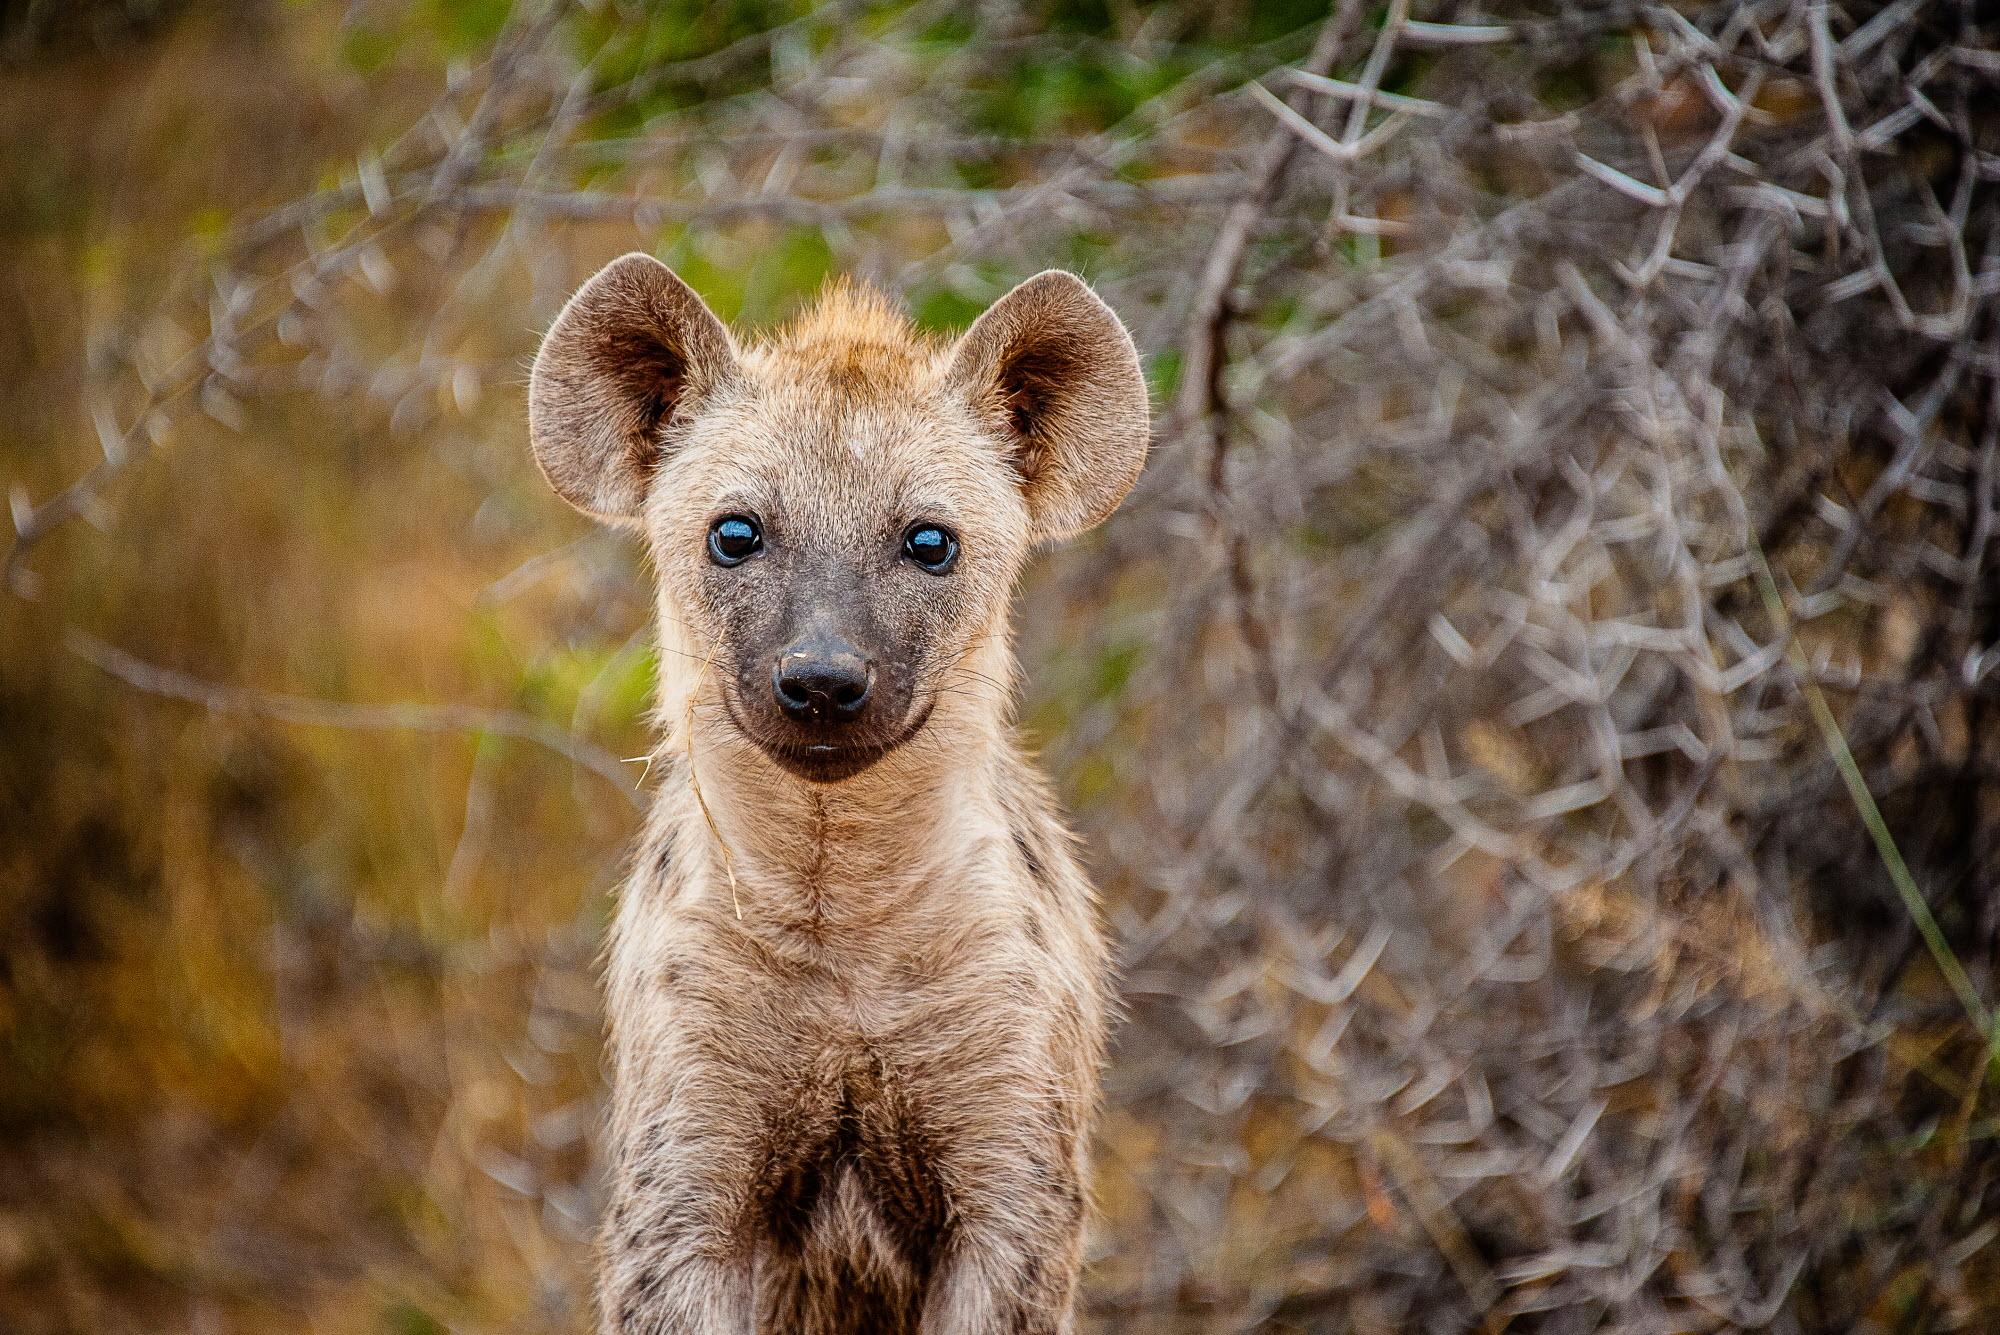 A spotted hyena portrait. Photo credit: Shannon Wild/Wildscreen Exchange